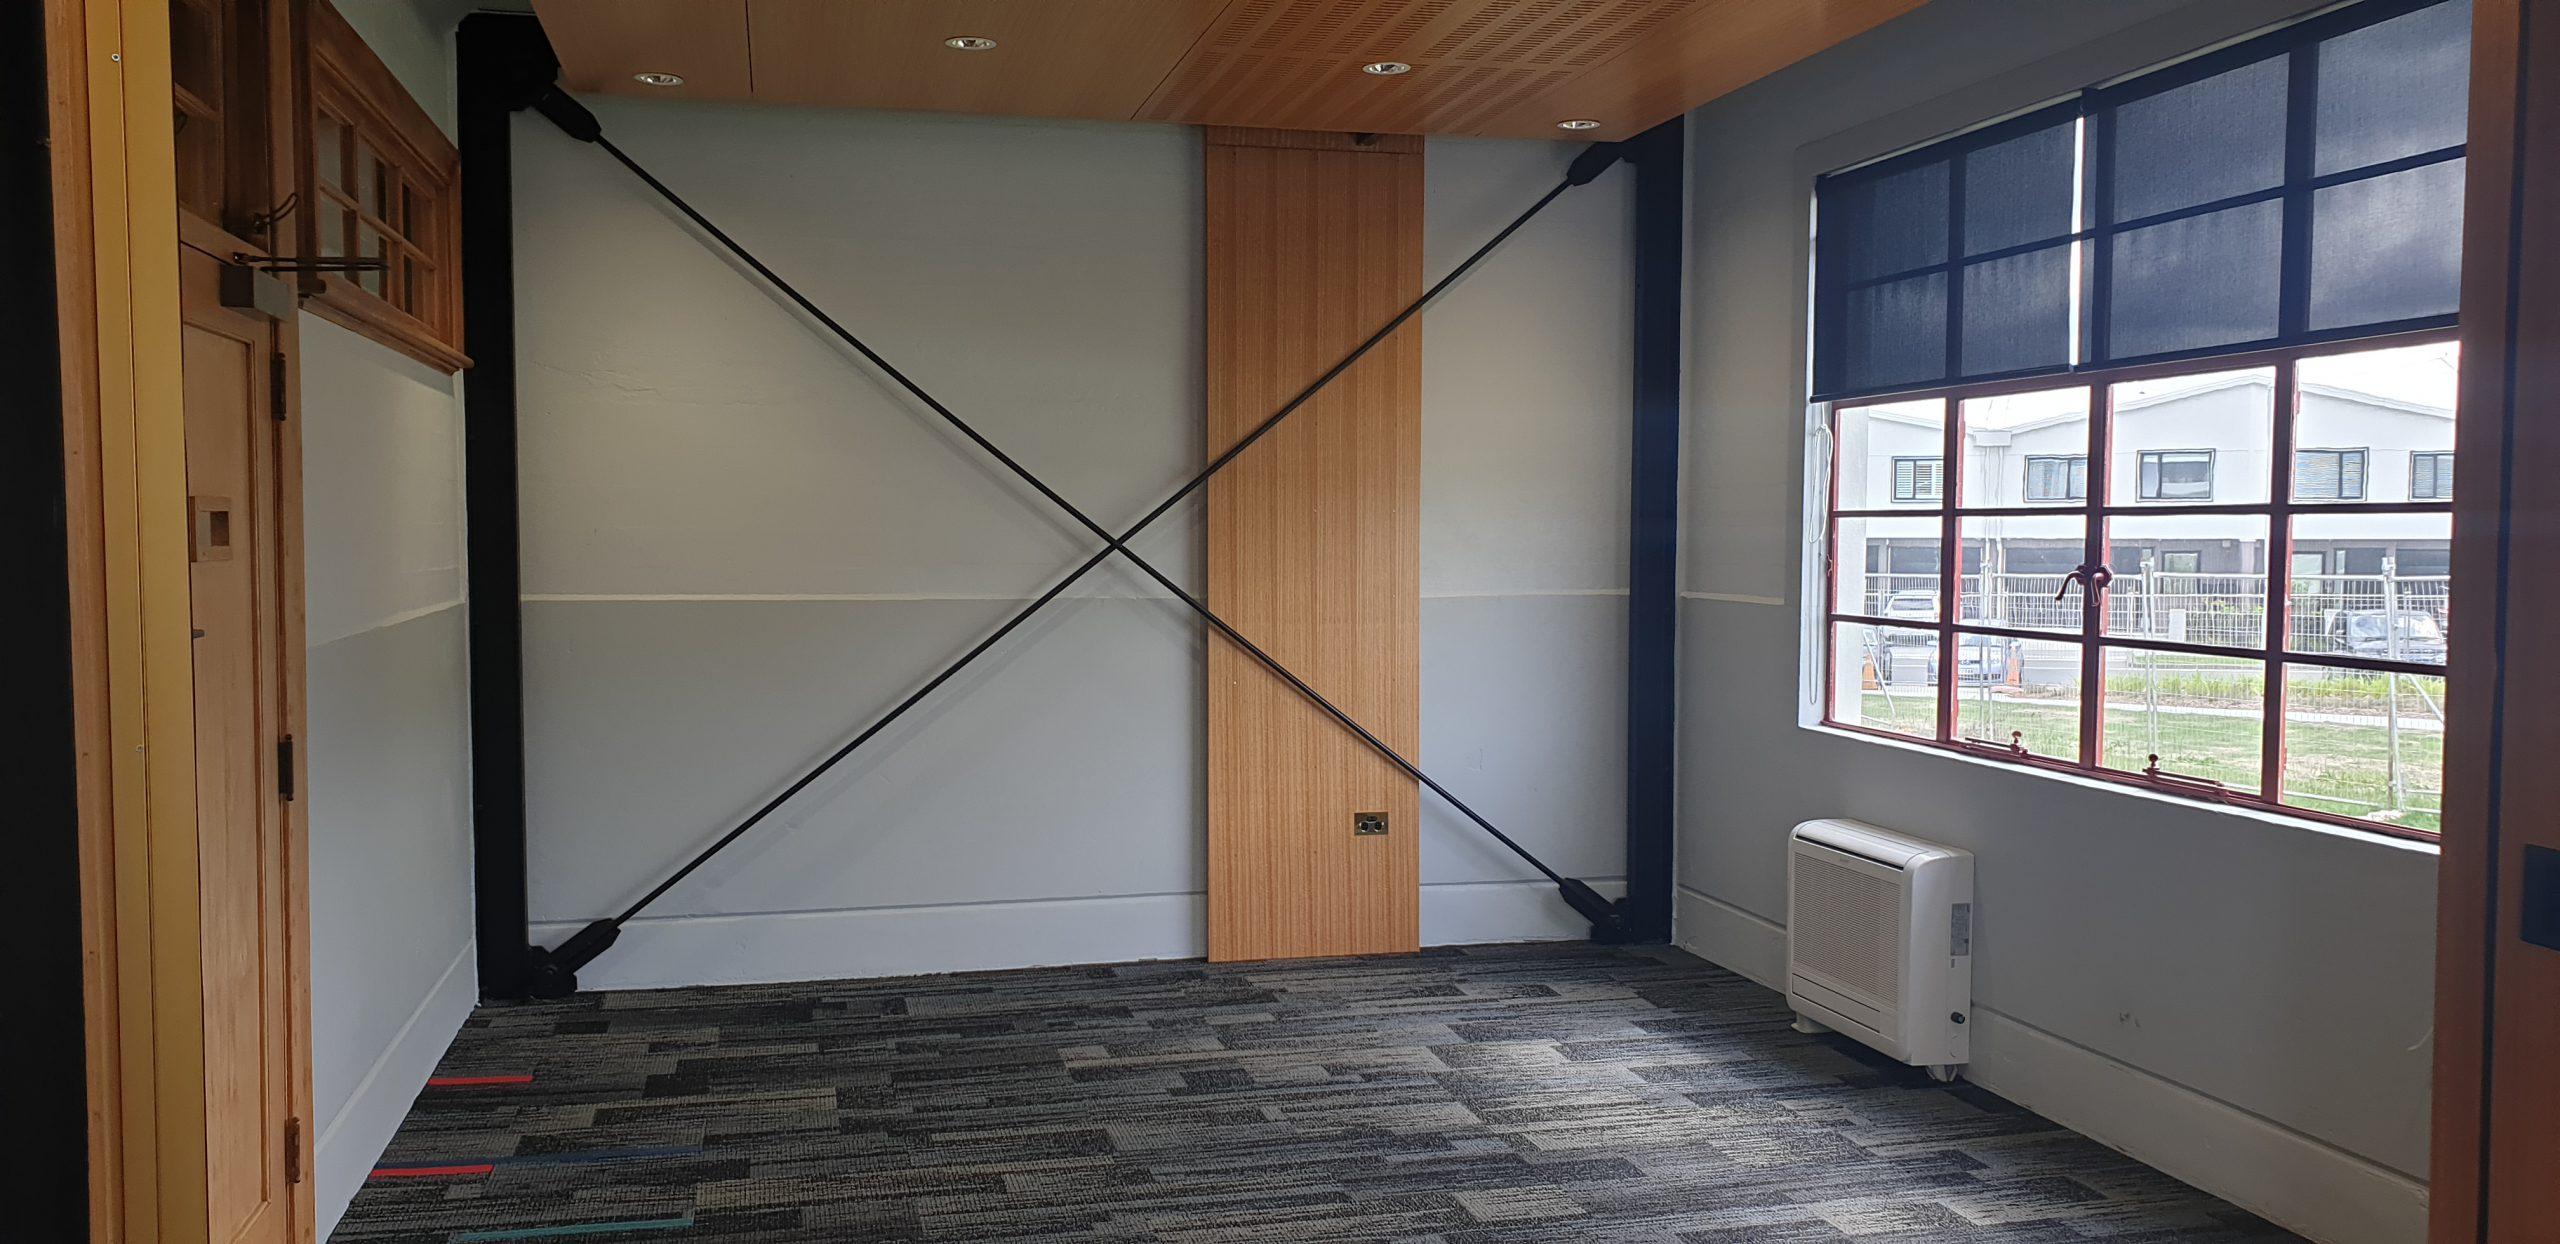 Iroquoix Room